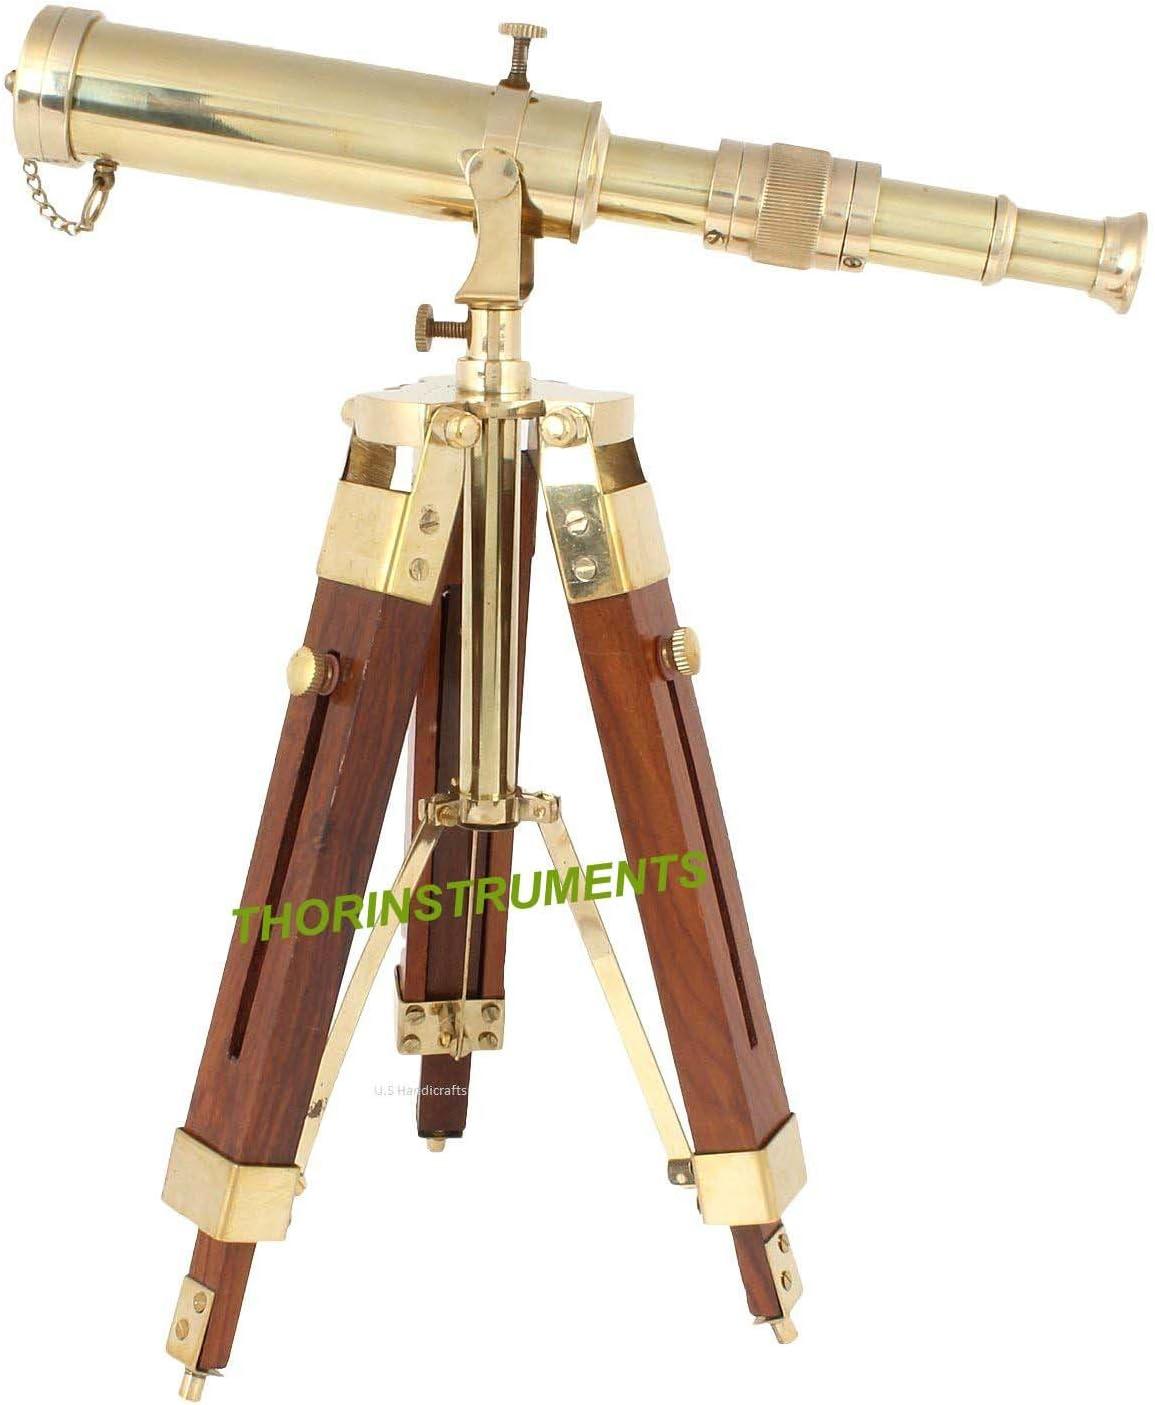 THORINSTRUMENTS (with device) Vintage Brass Nautical Telescope on Tripod Stand Desktop Telescope Outdoor Adventures